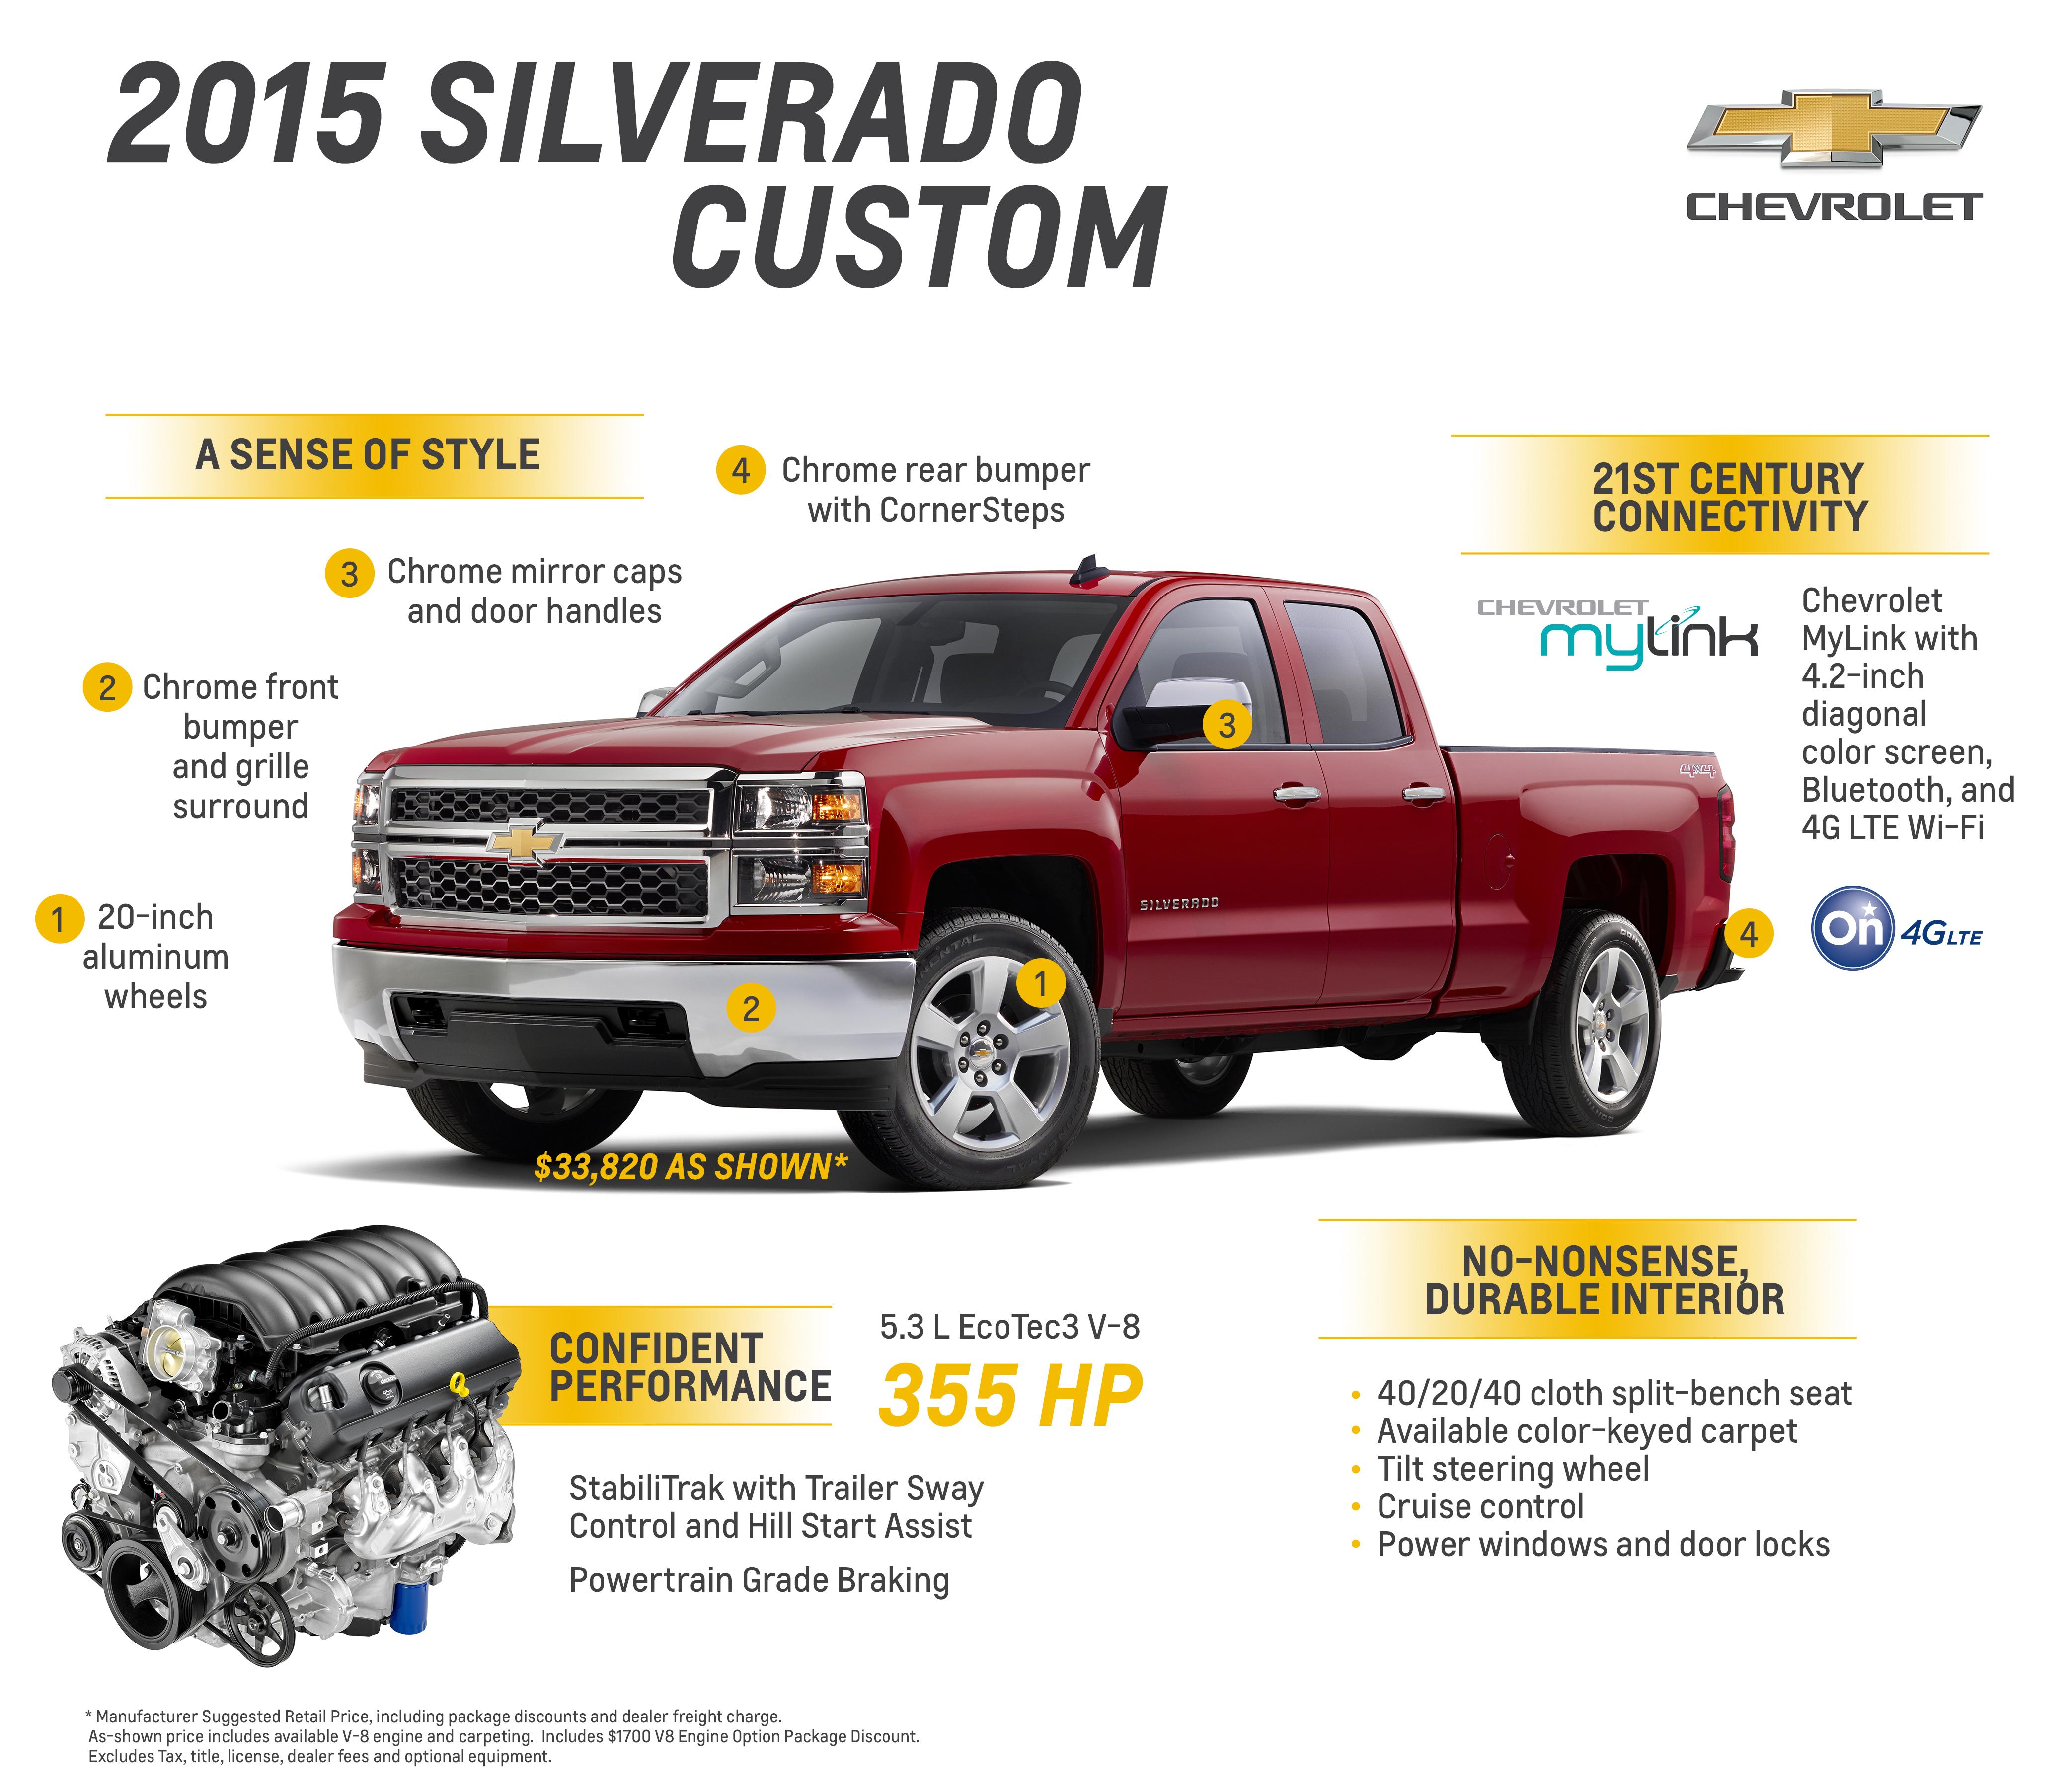 Kelebihan Chevrolet Silverado 2015 Tangguh